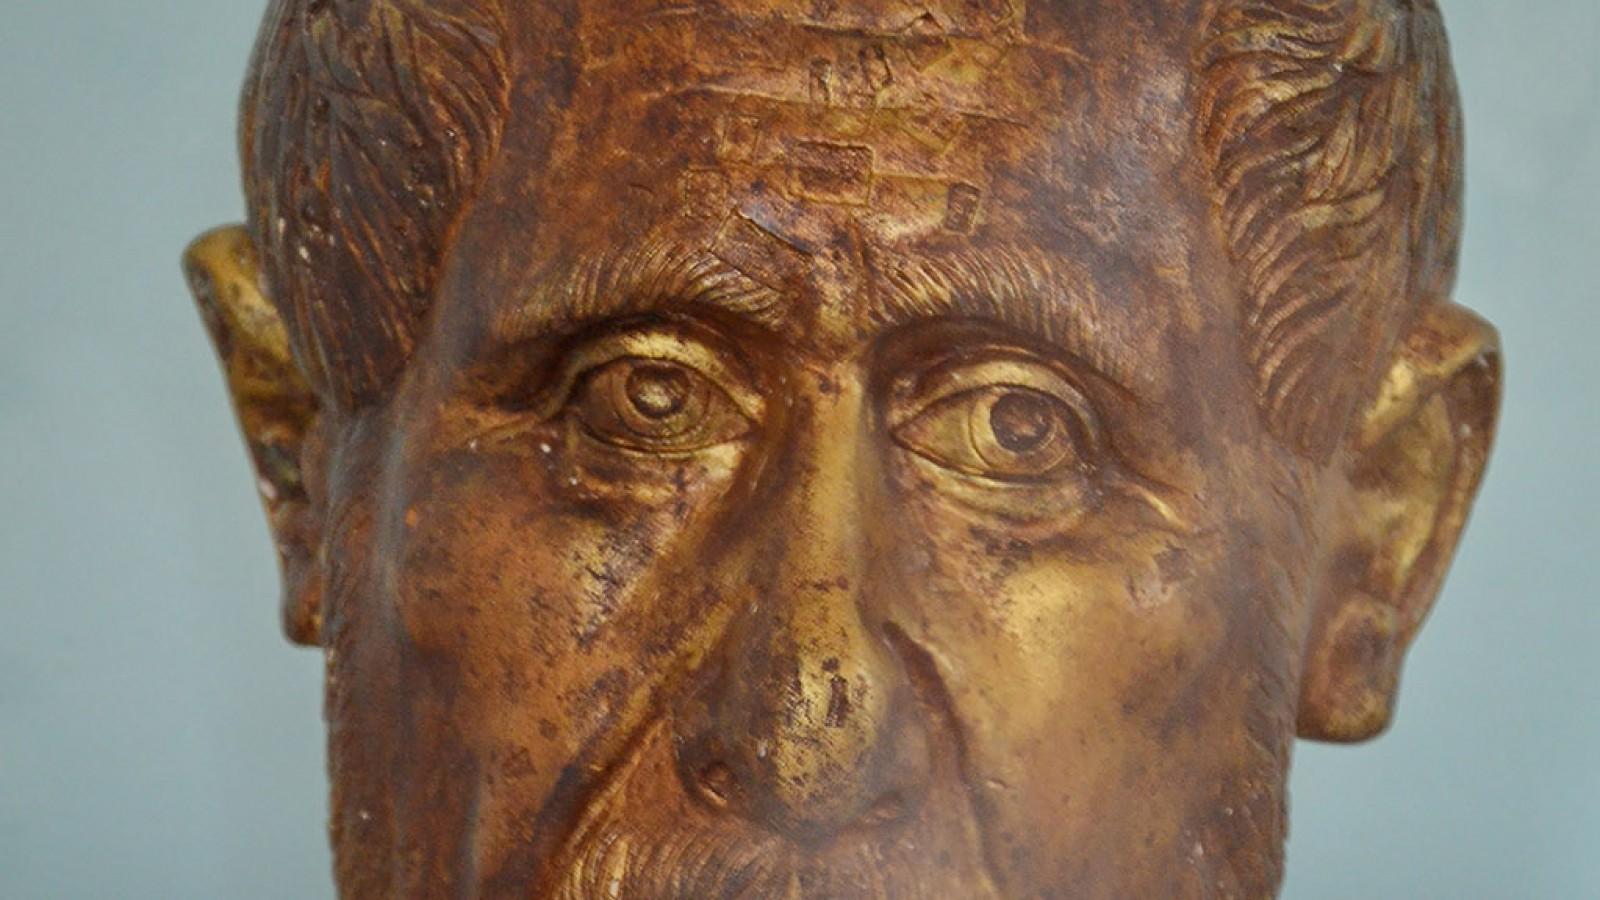 Muzeul si Situl Arheologic Ulpia Traiana Sarmizegetusa